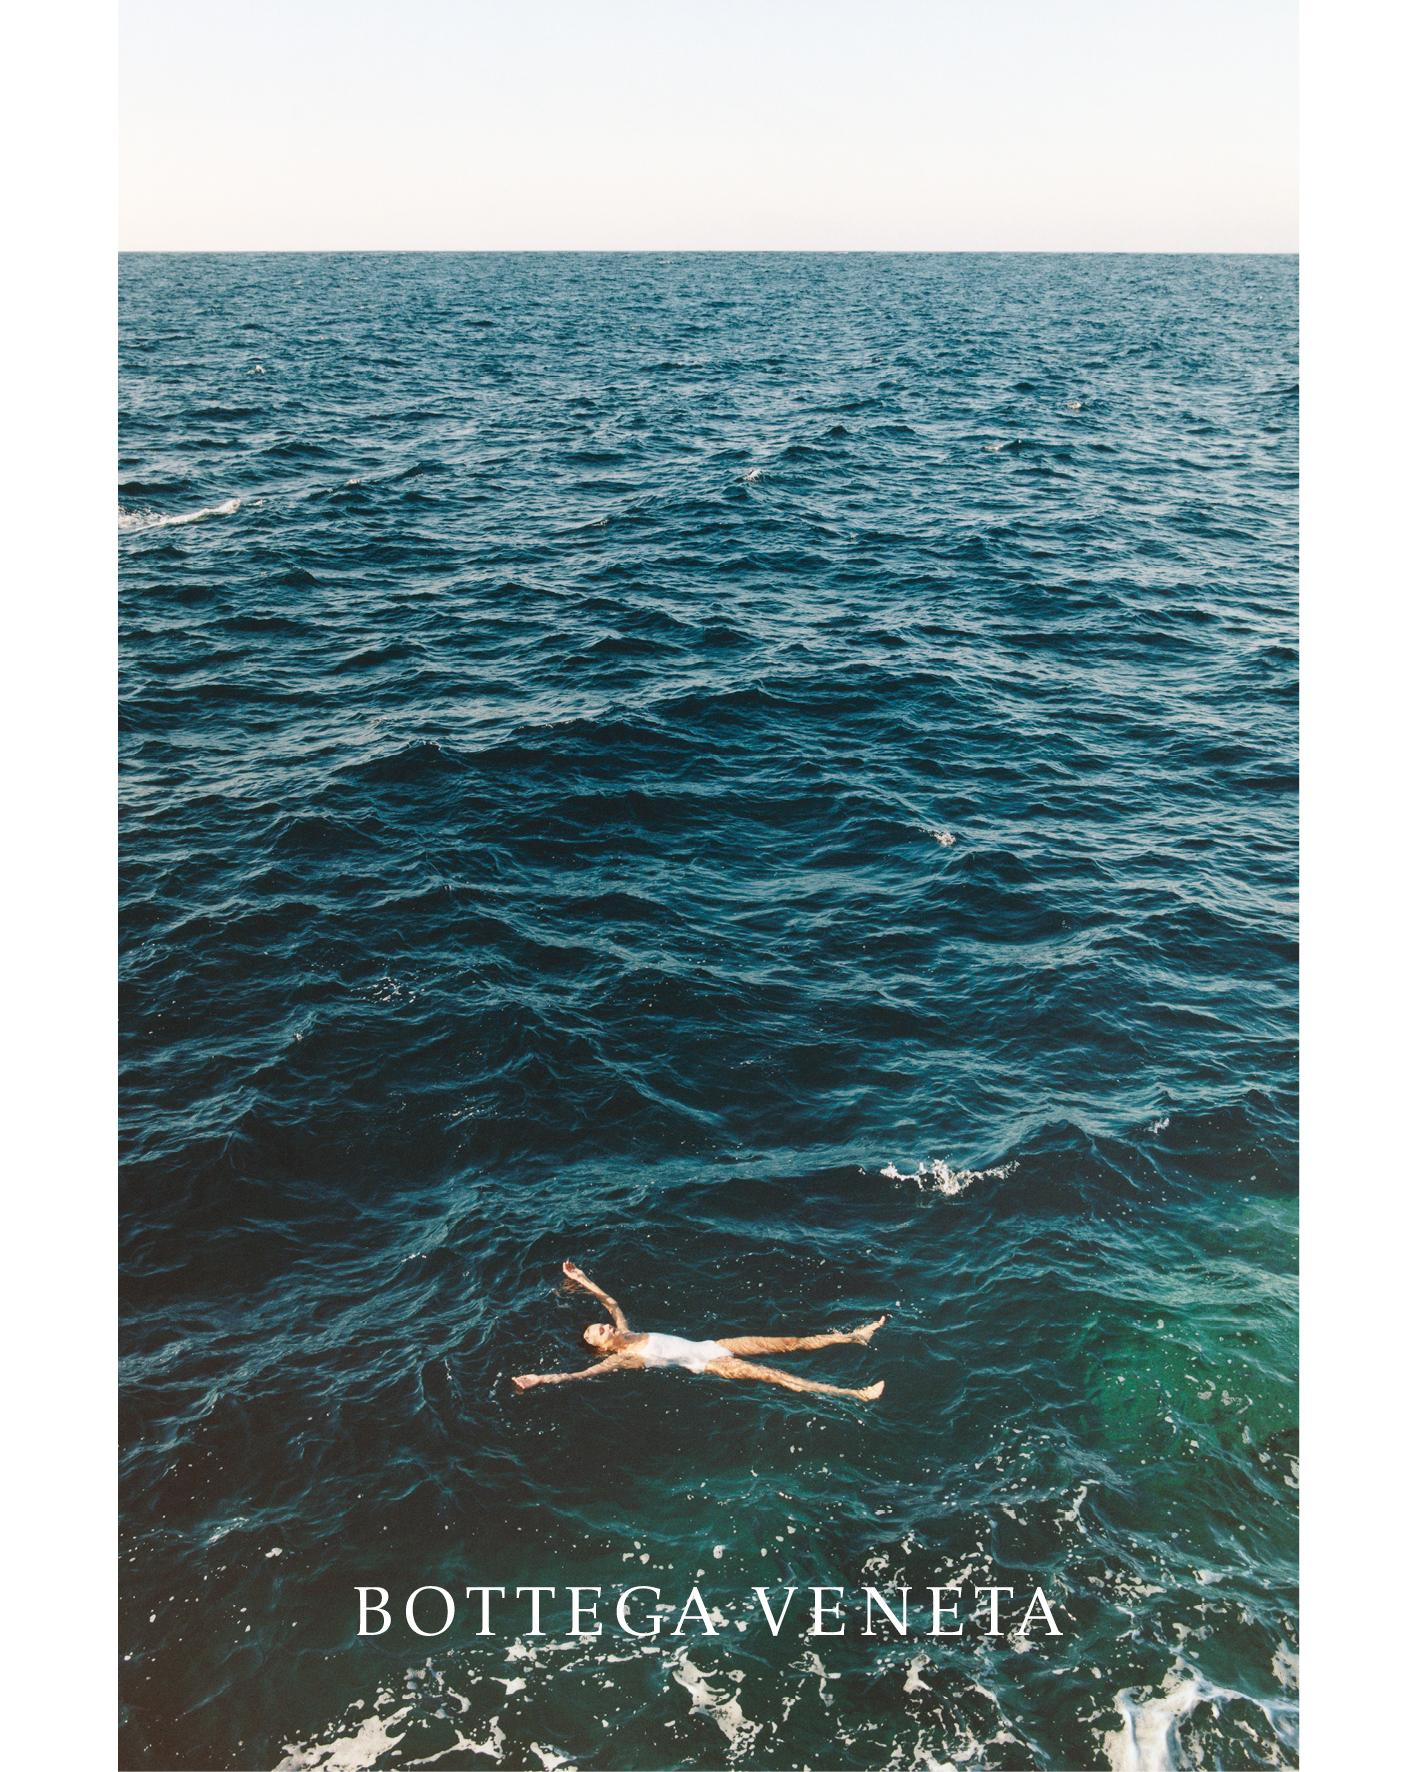 BOTTEGA VENETA - SS 2019 Photographer: Tyrone Lebon Model: Sakia De Brauw, Kaya Wilkins, Oceana Celeste Mawrence  Stylist: Marie Chaix Location: Ischia - Italy